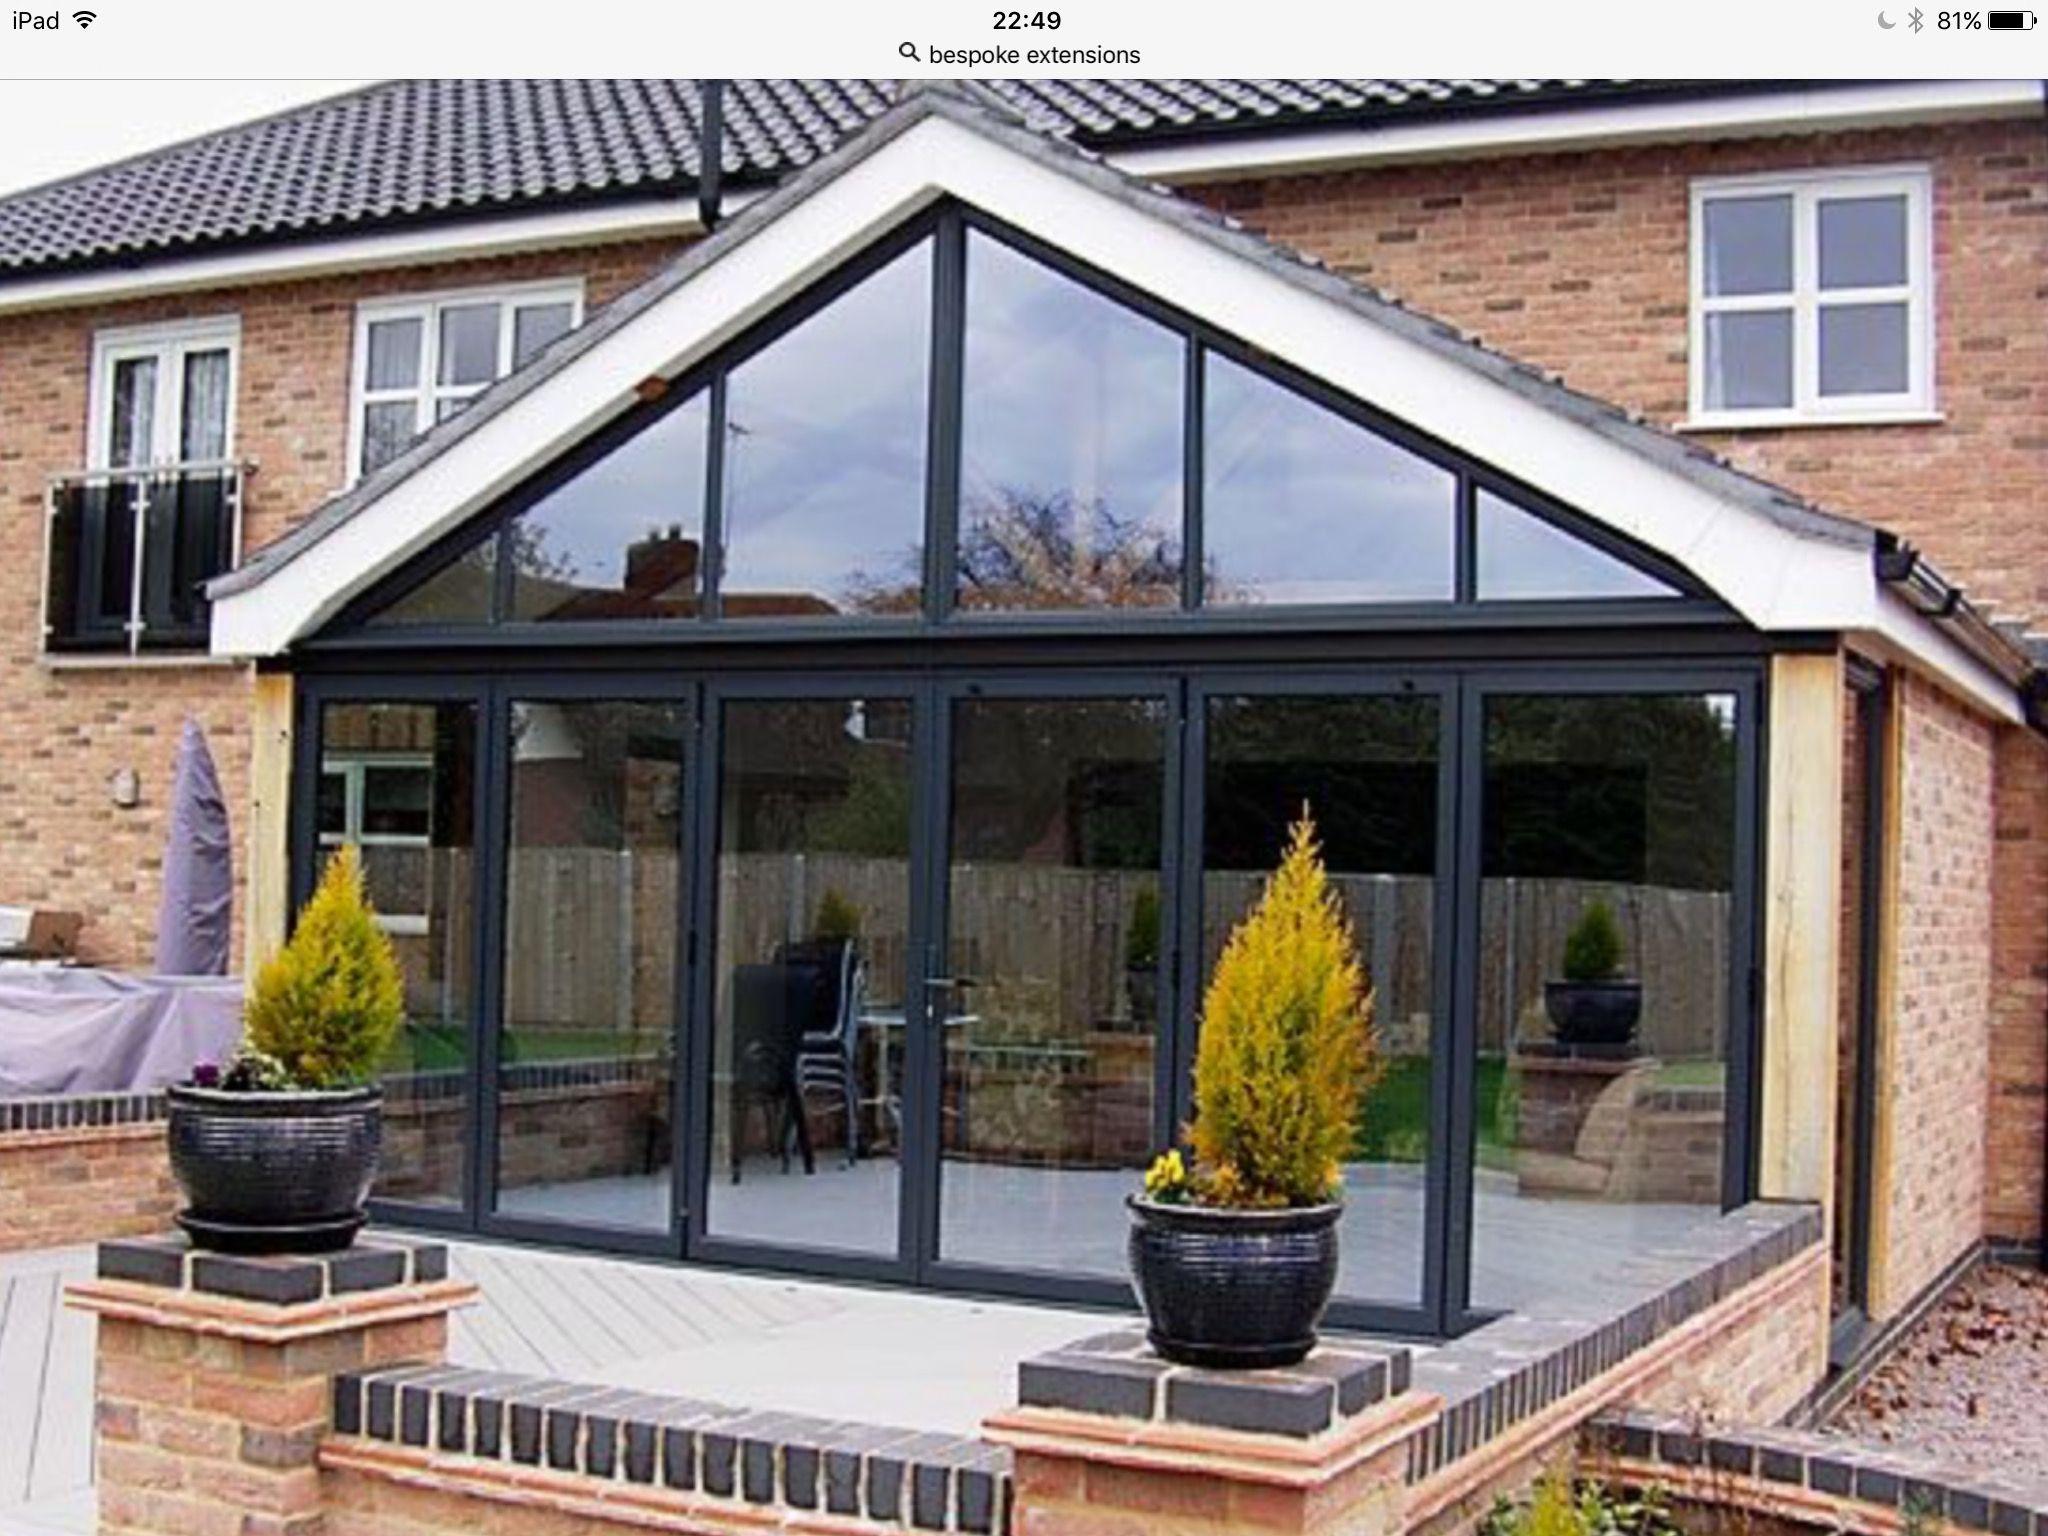 Gable end extension | Kitchen extension, Orangery ...